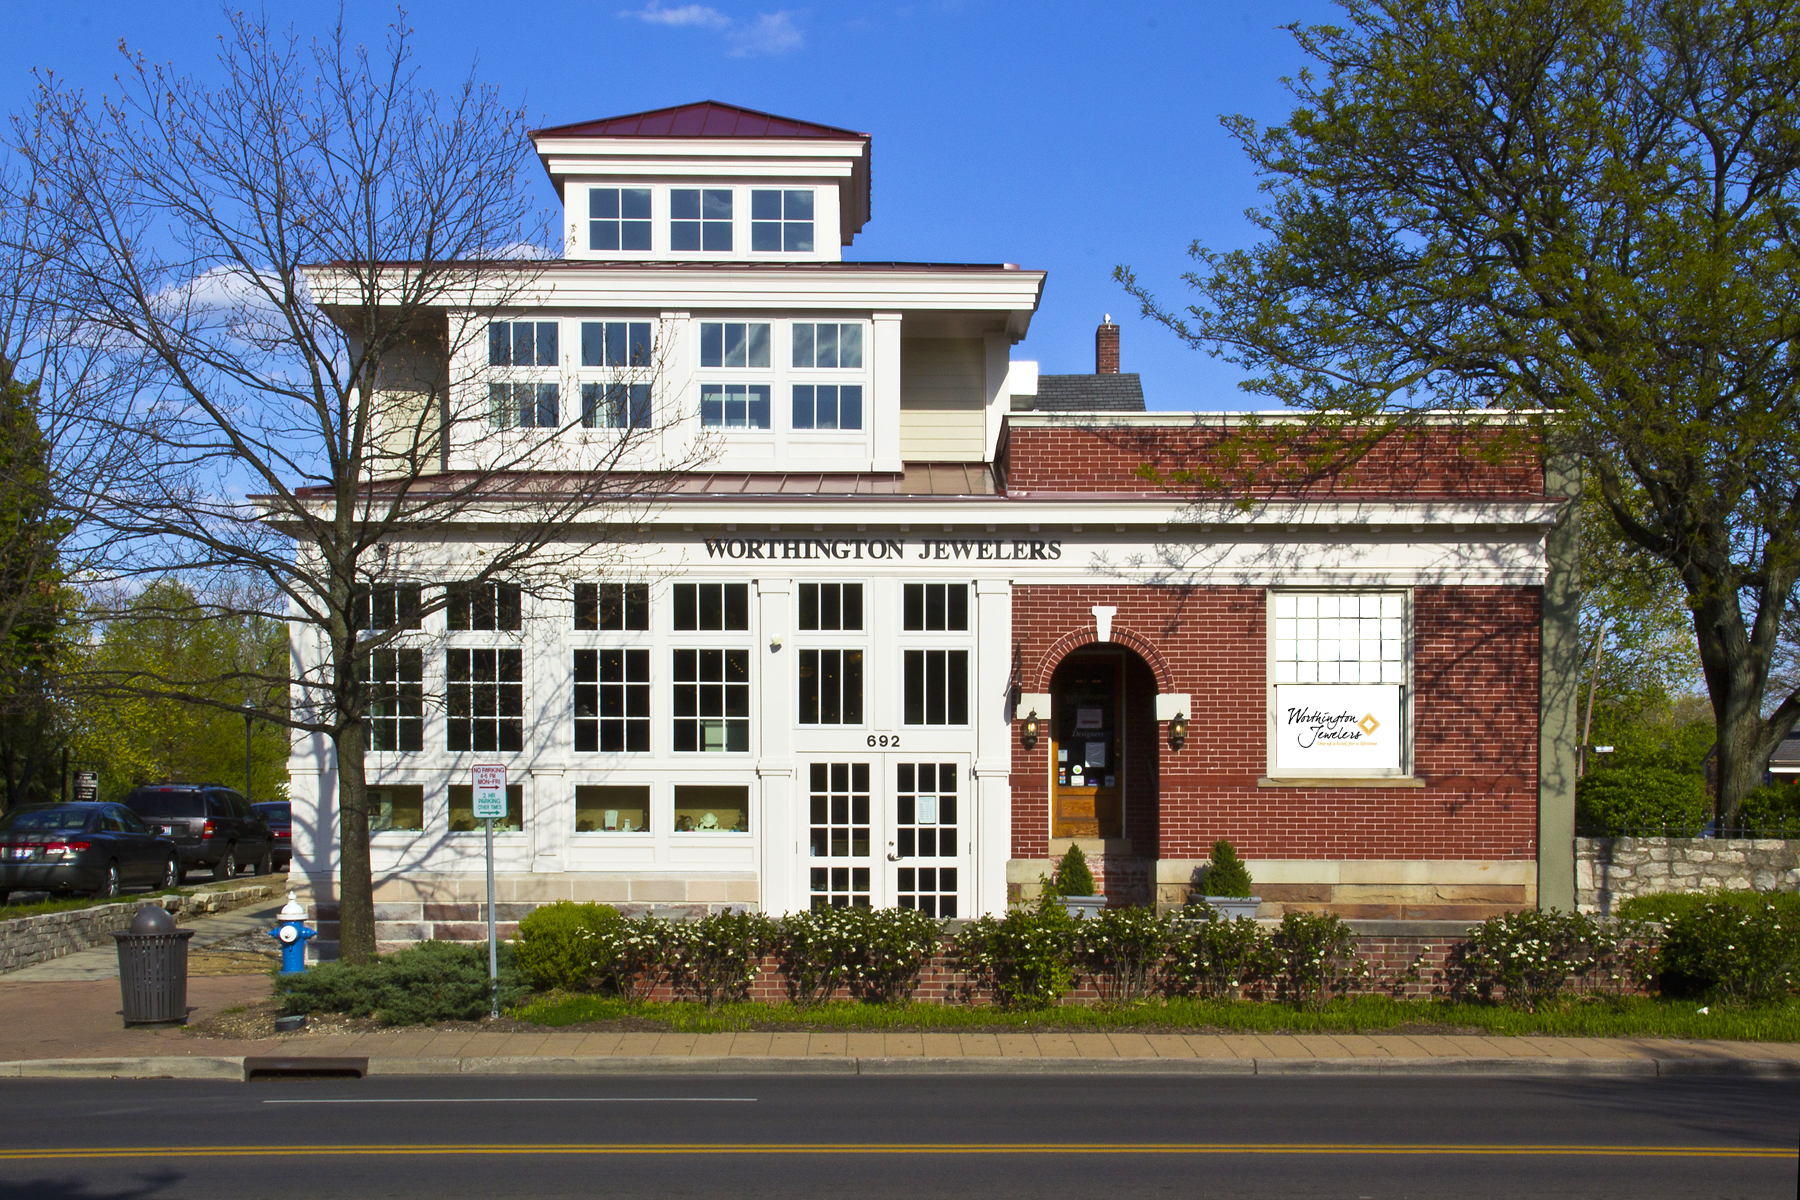 watch repair in Worthington, Richmond, VA | Reviews ...